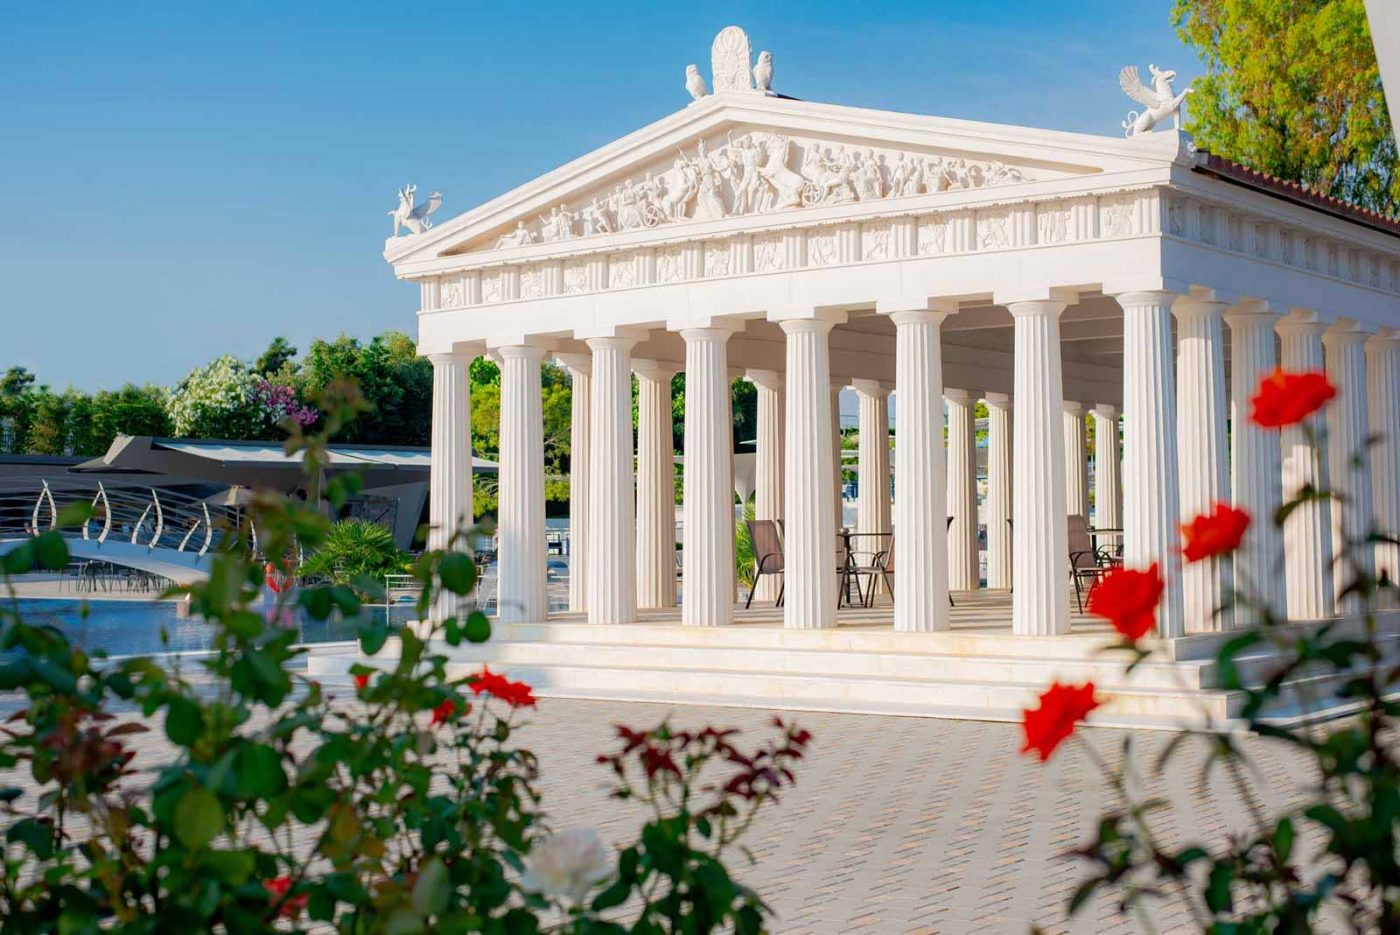 Parthenon in spring